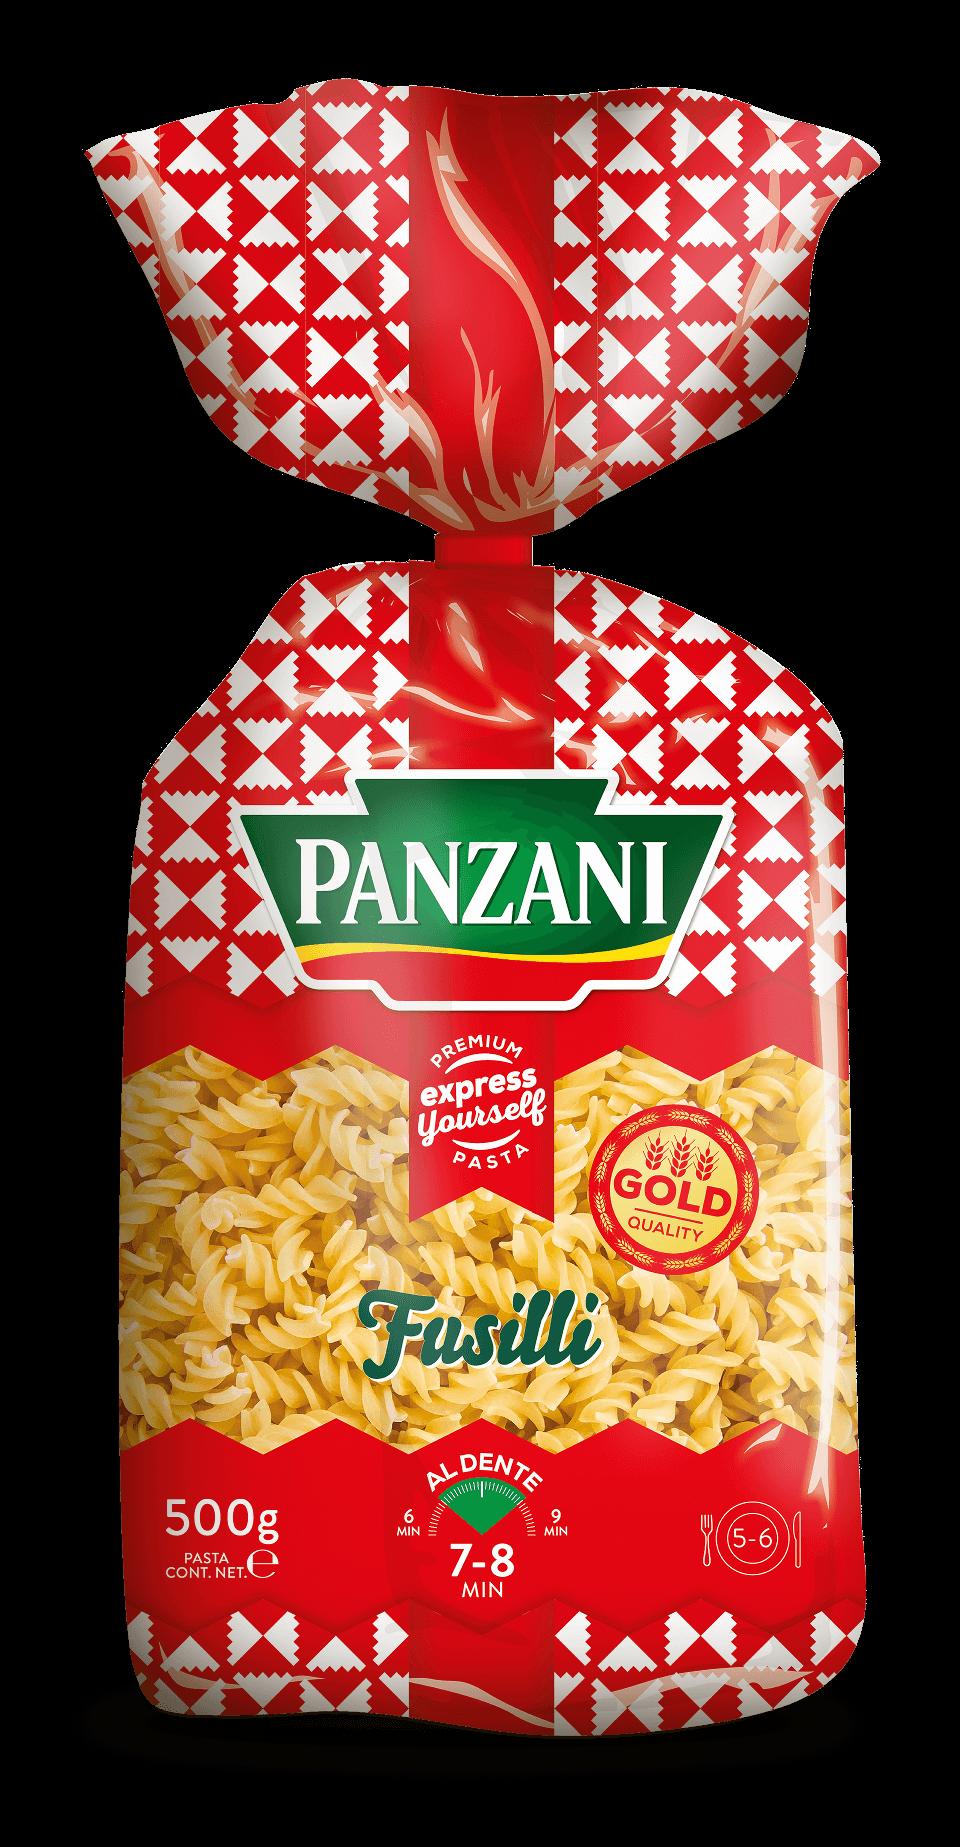 Spaghetti clipart full plate food. Products via panzani packfusilli